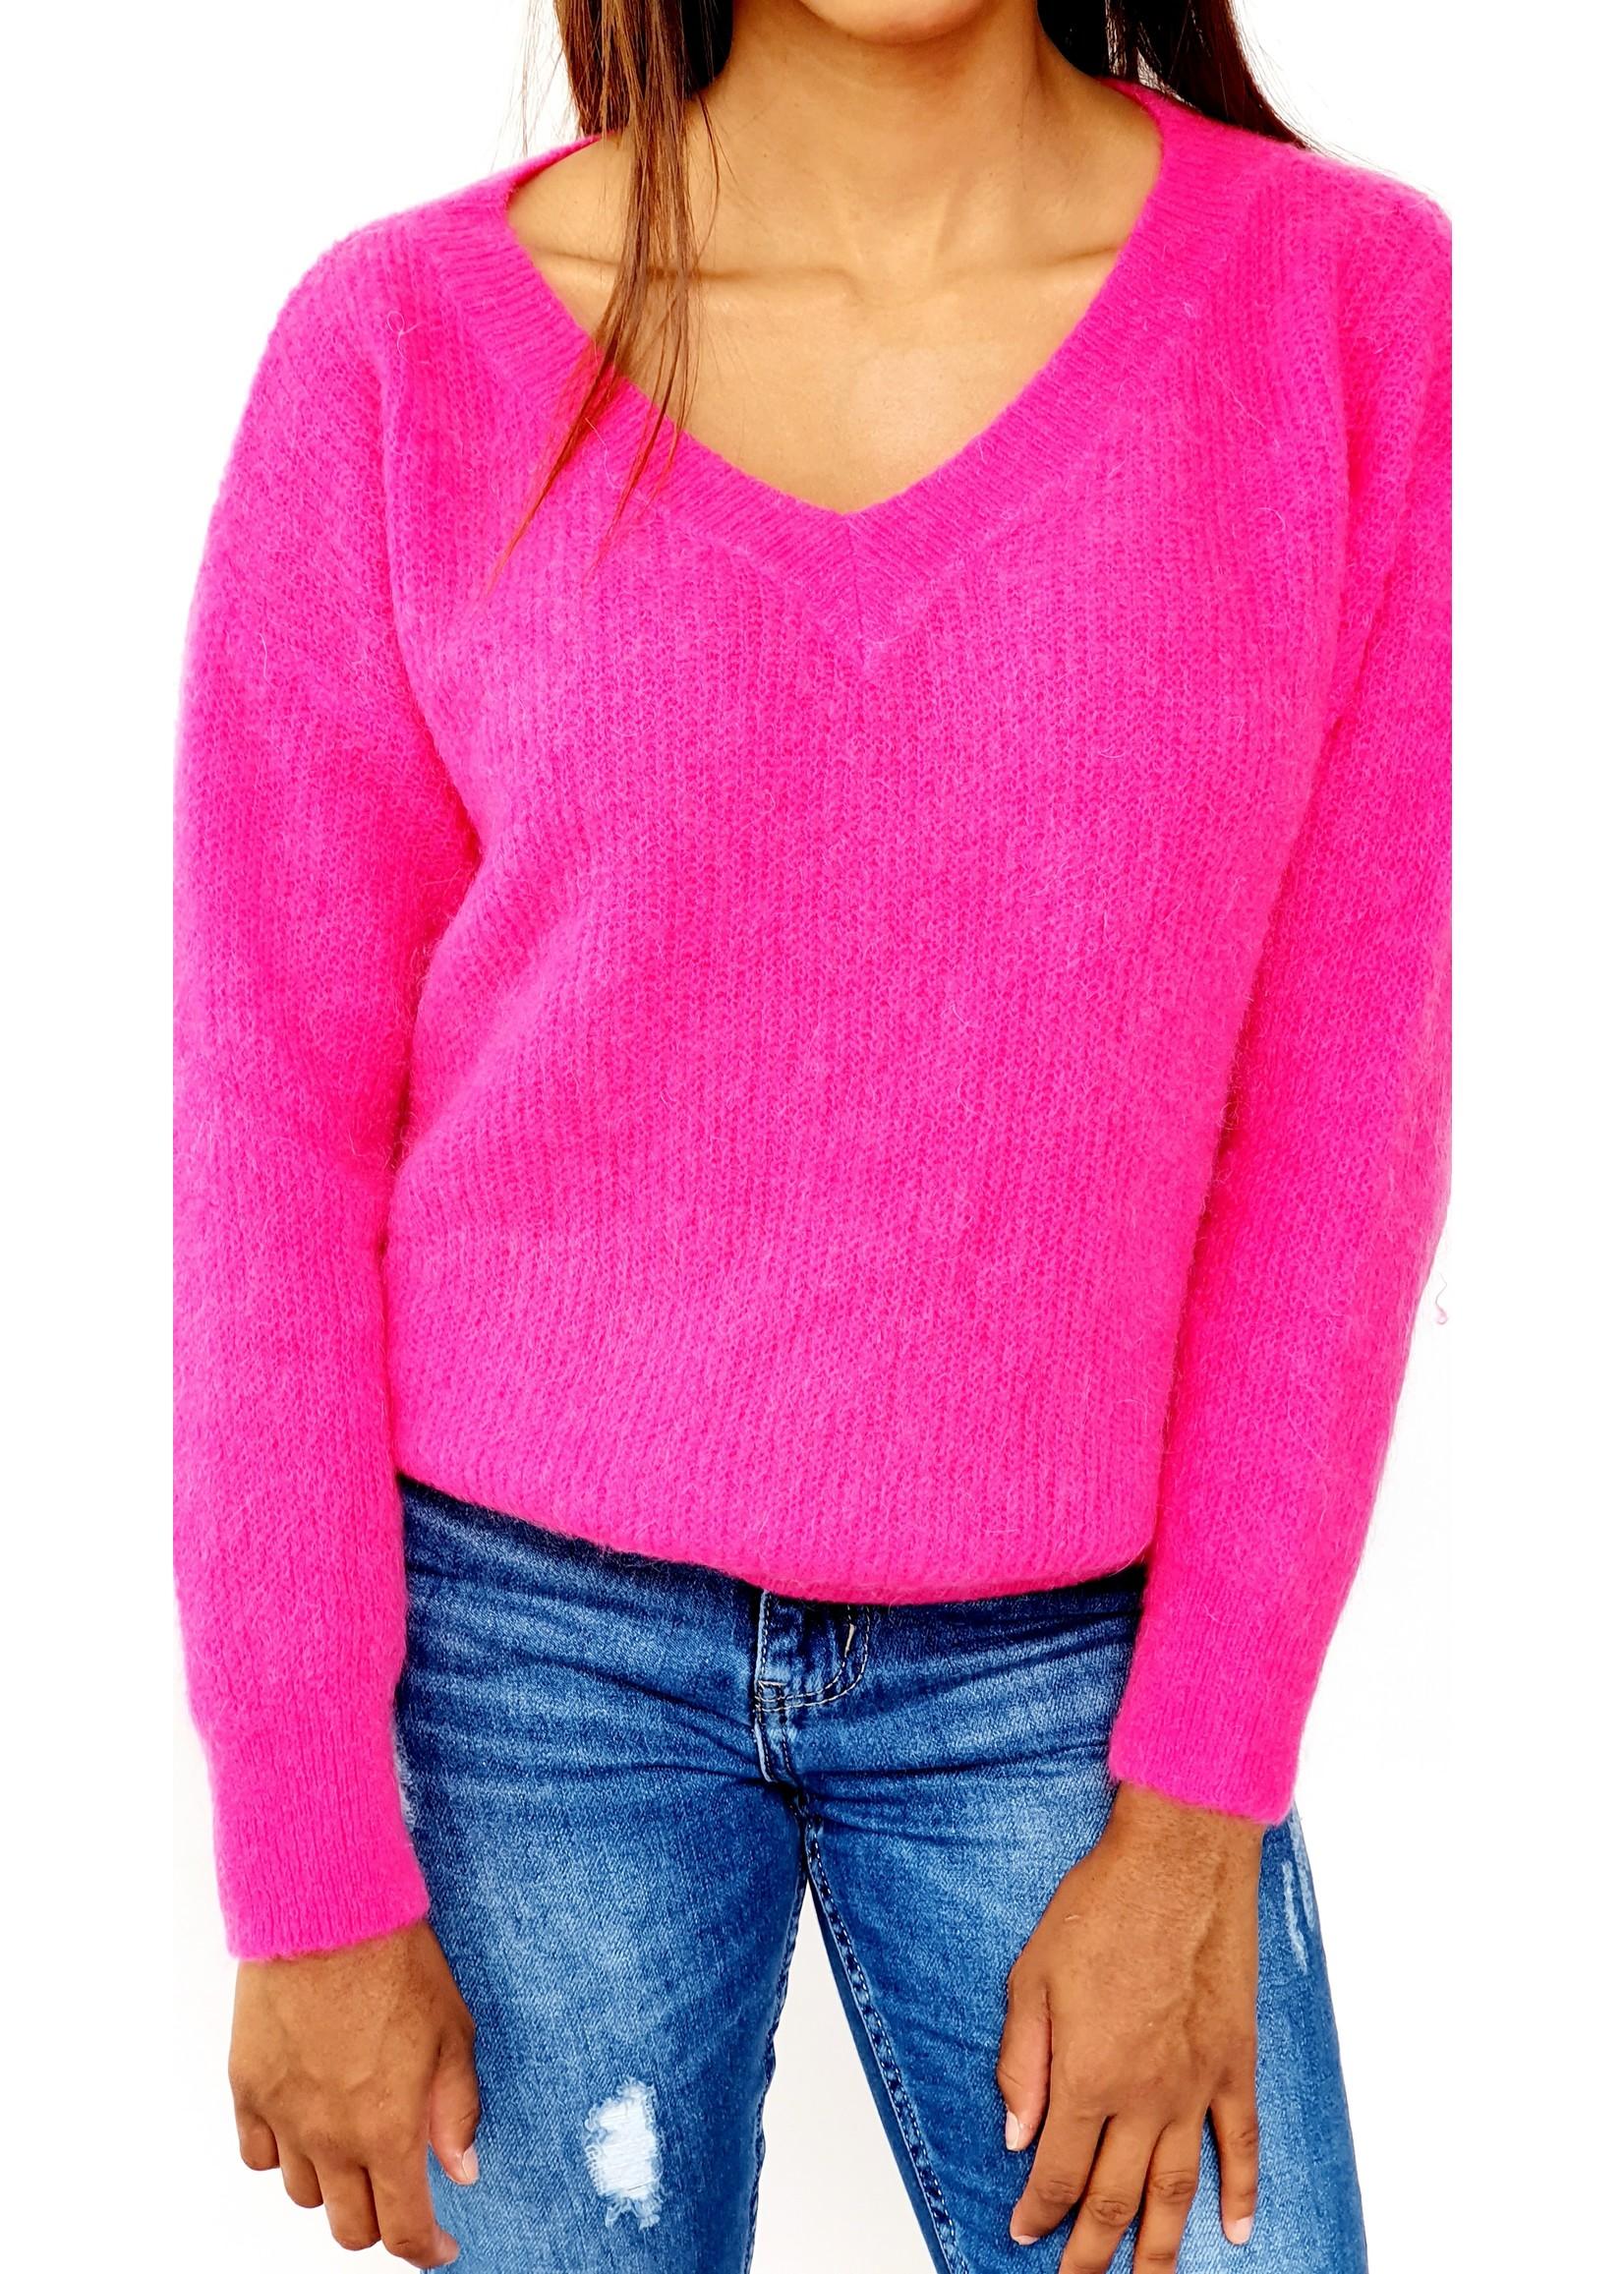 Fuchsia feeling knitted sweater